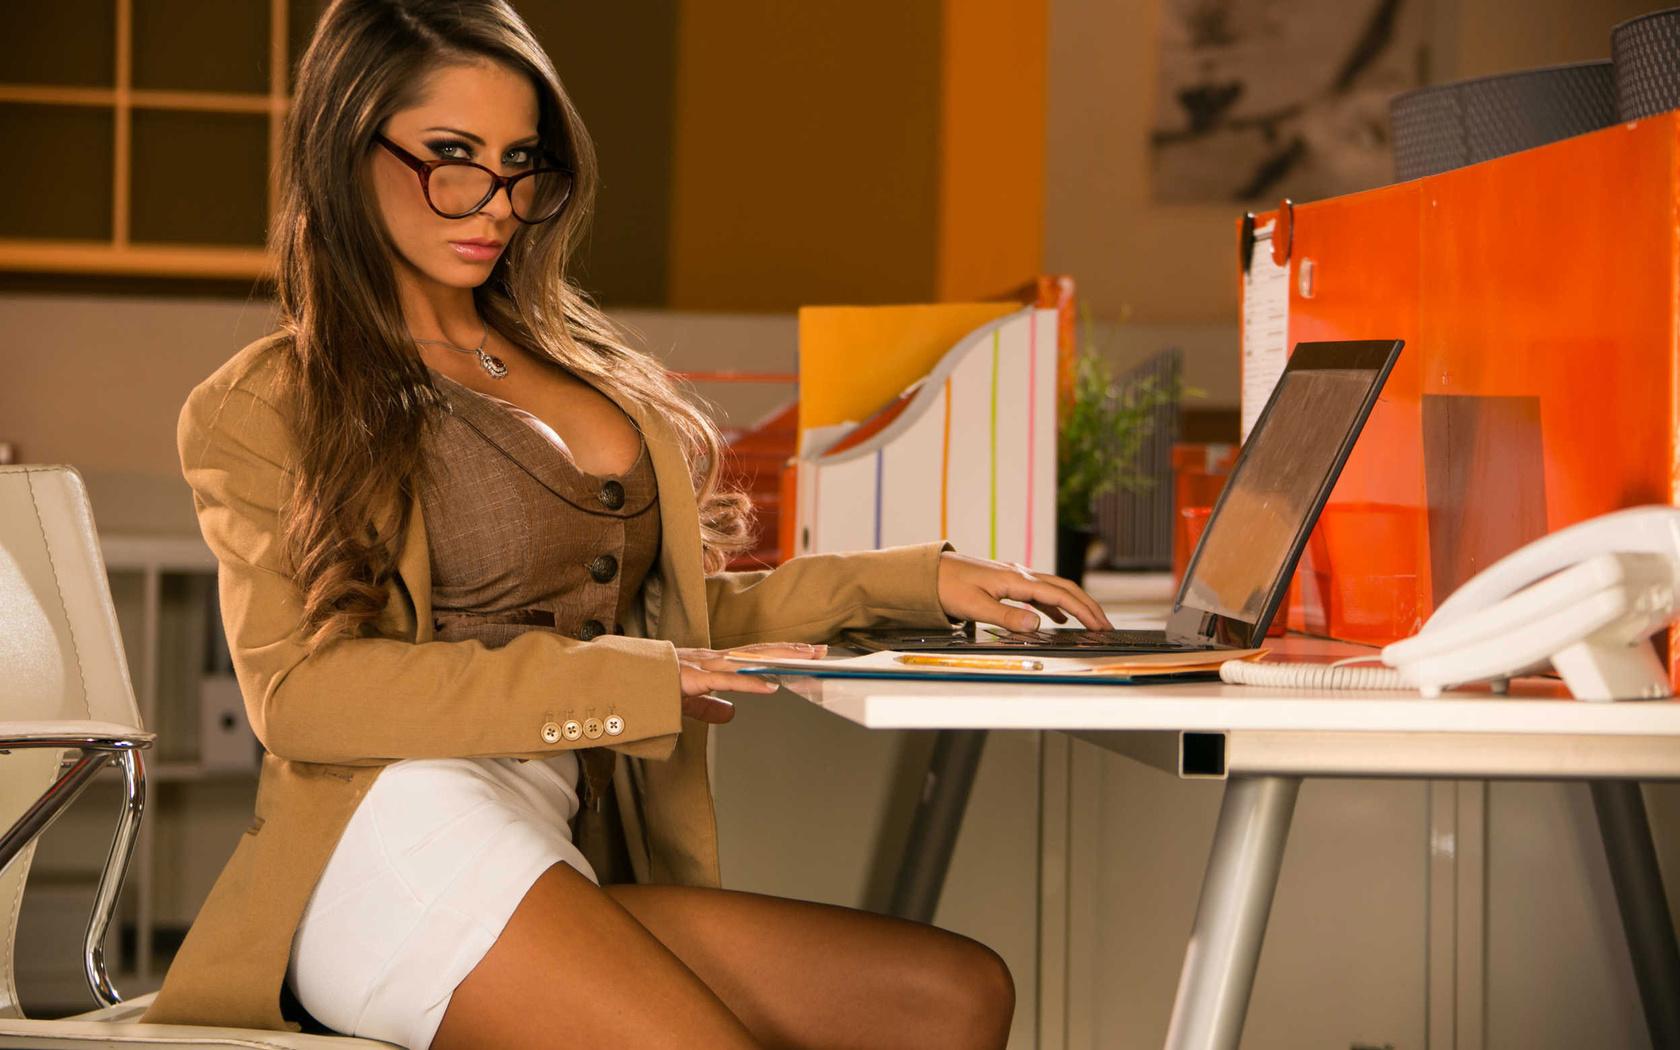 seks-seksualnih-zhenshin-s-krasivimi-grudyami-v-ofisah